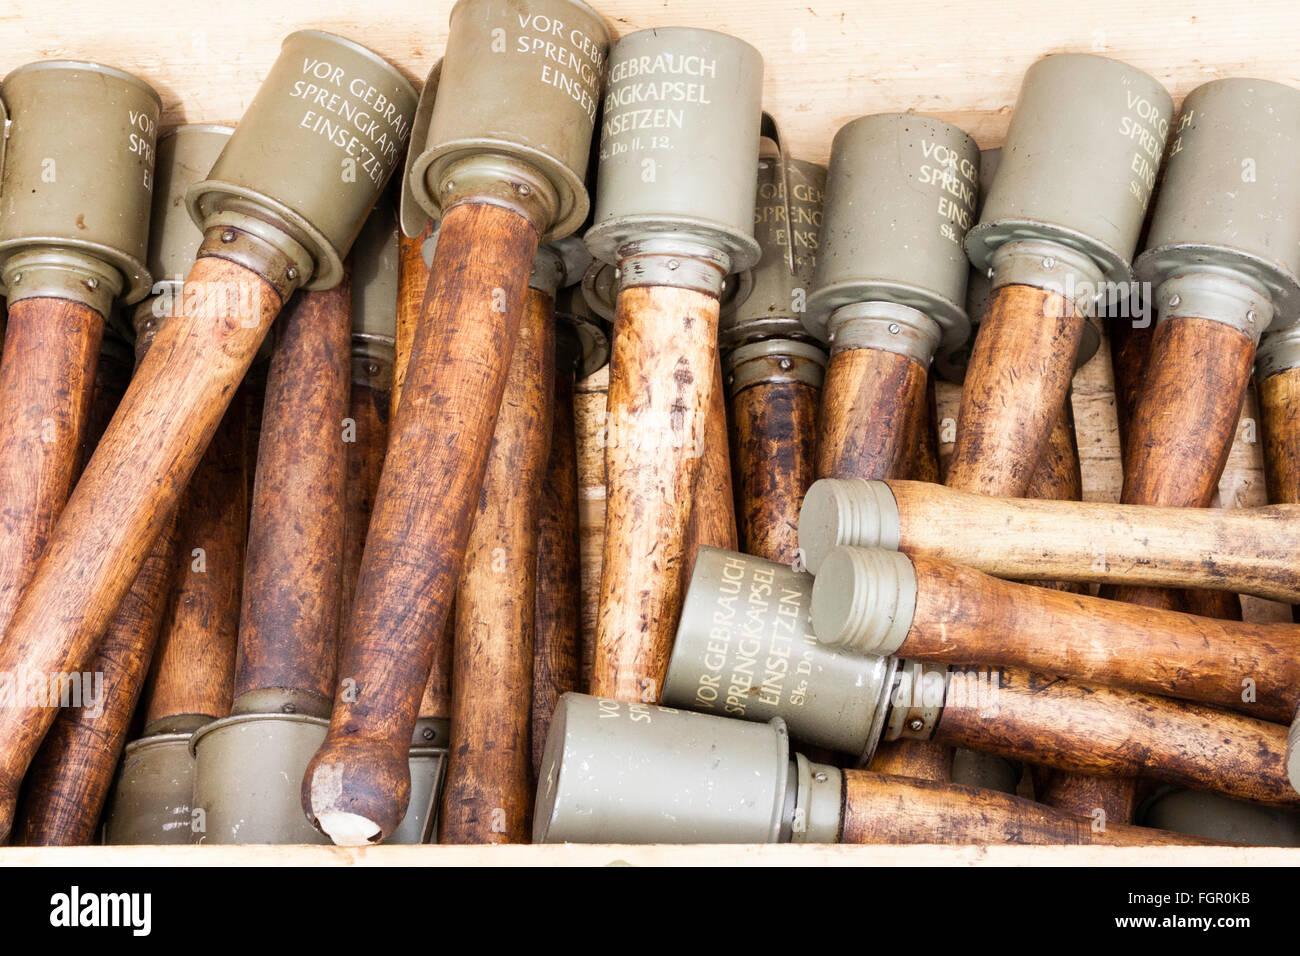 Ww2 Grenade Stock Photos & Ww2 Grenade Stock Images - Alamy